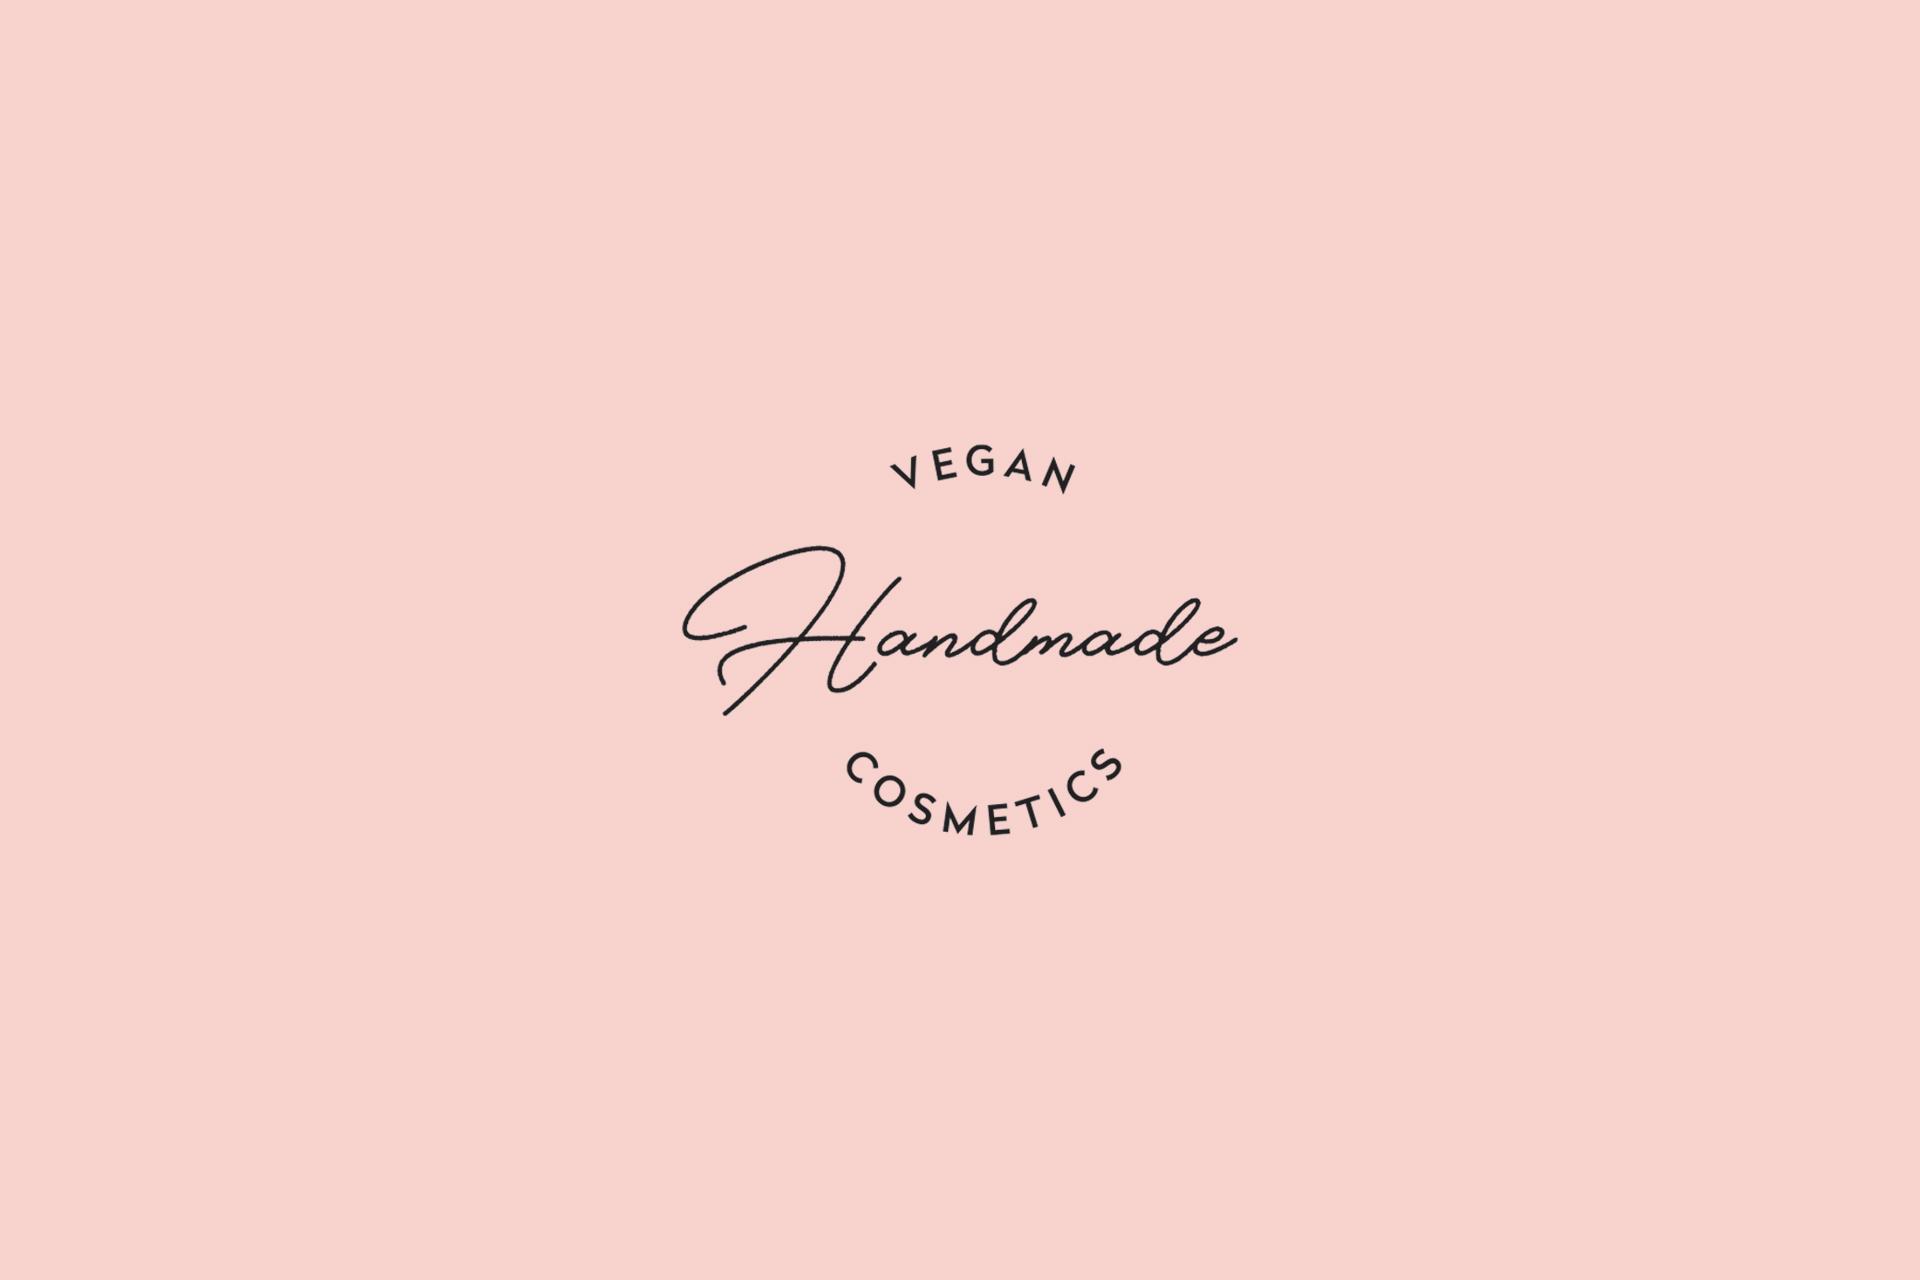 Primal_Essence_Handmade_Vegan